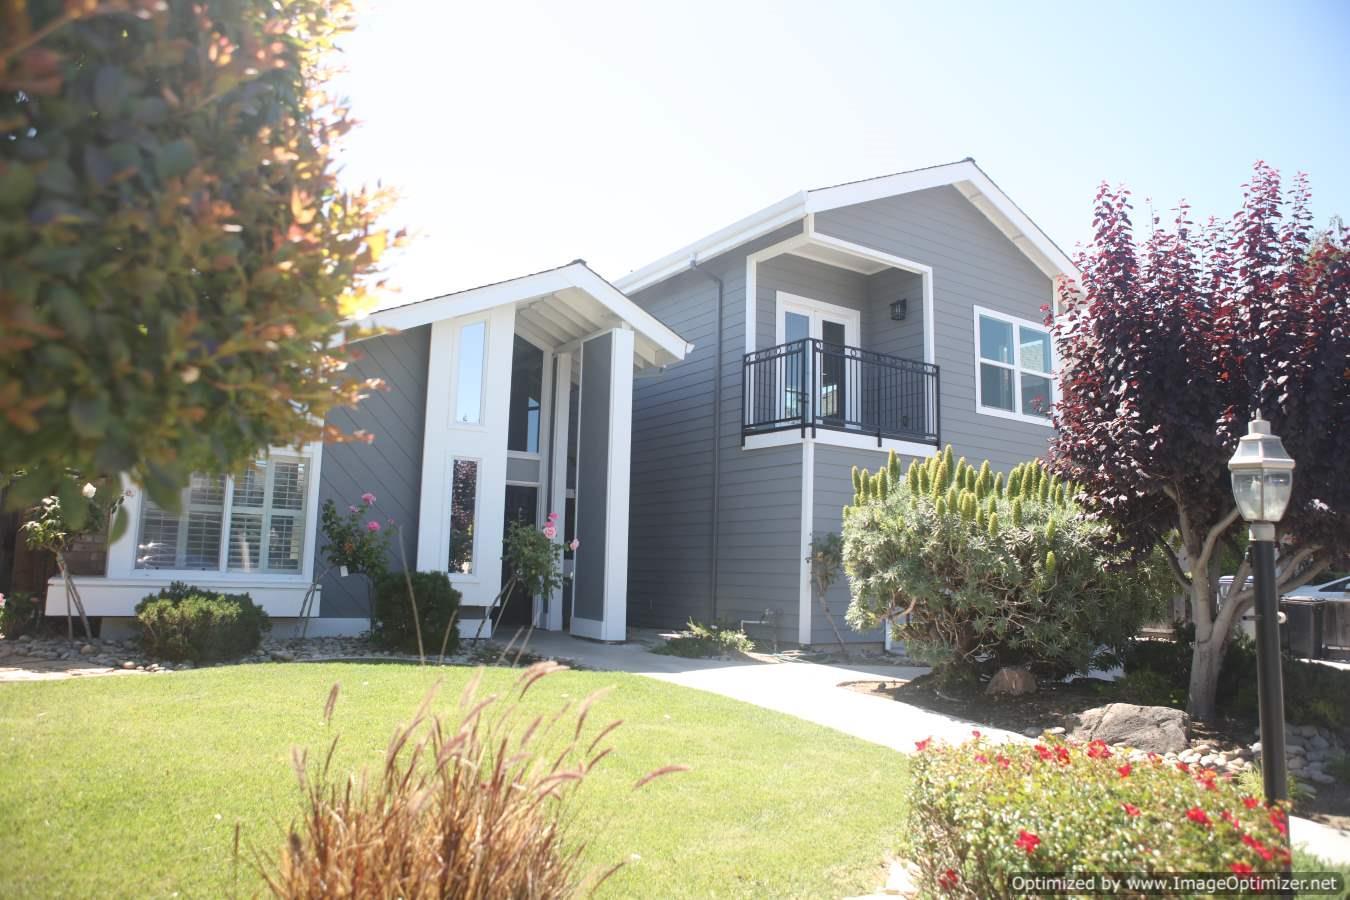 Single Family Home for Sale at 4113 Ashbrook Circle San Jose, California 95124 United States